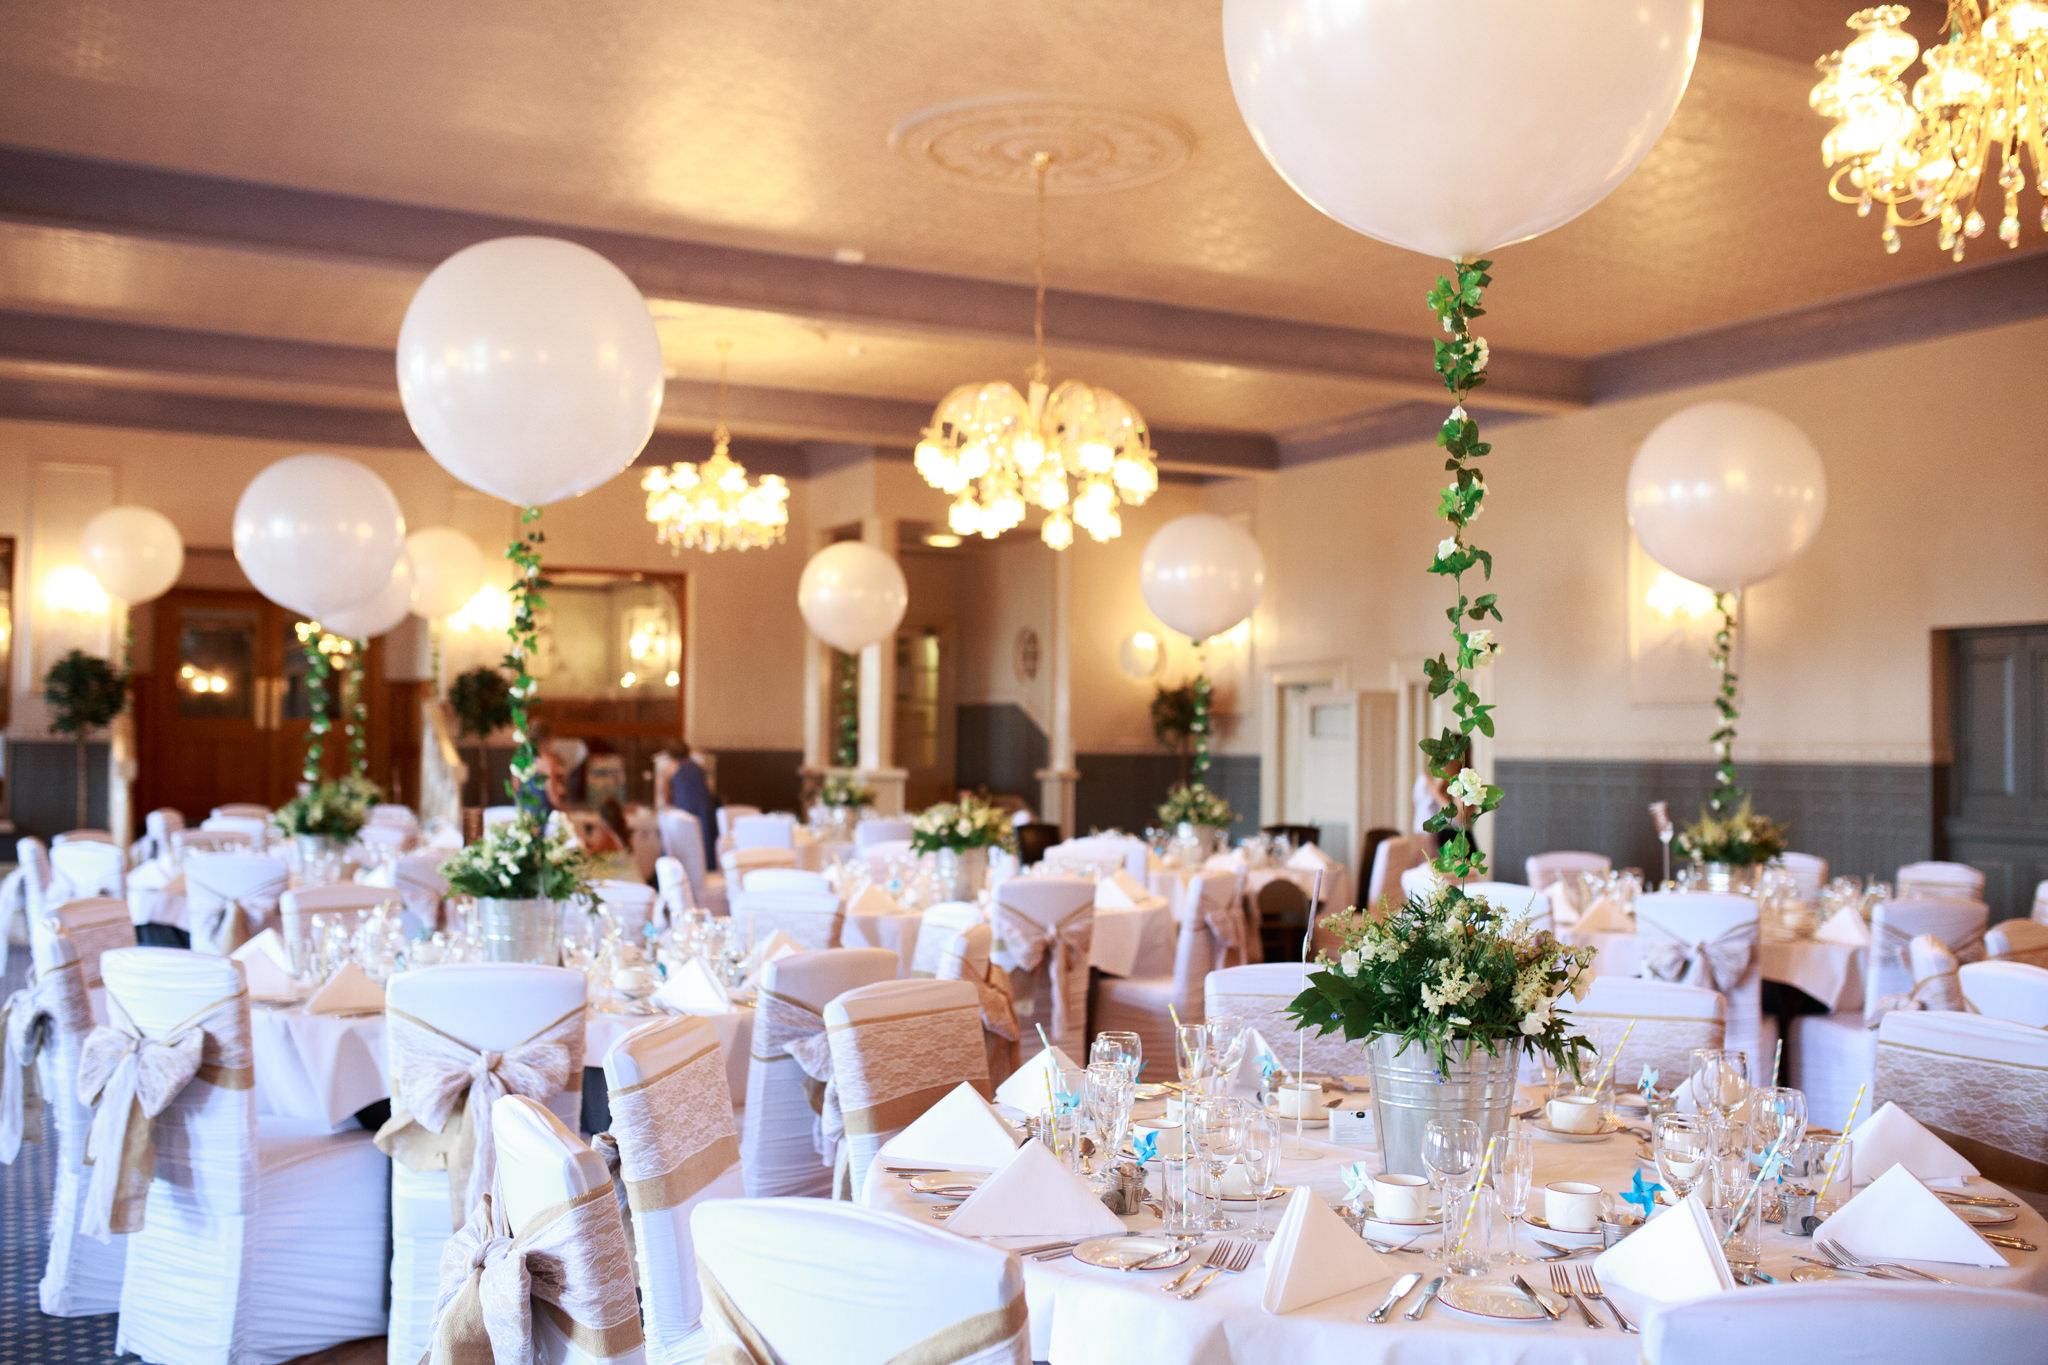 Wedding Photographer In Exeter 001_-2.jpg